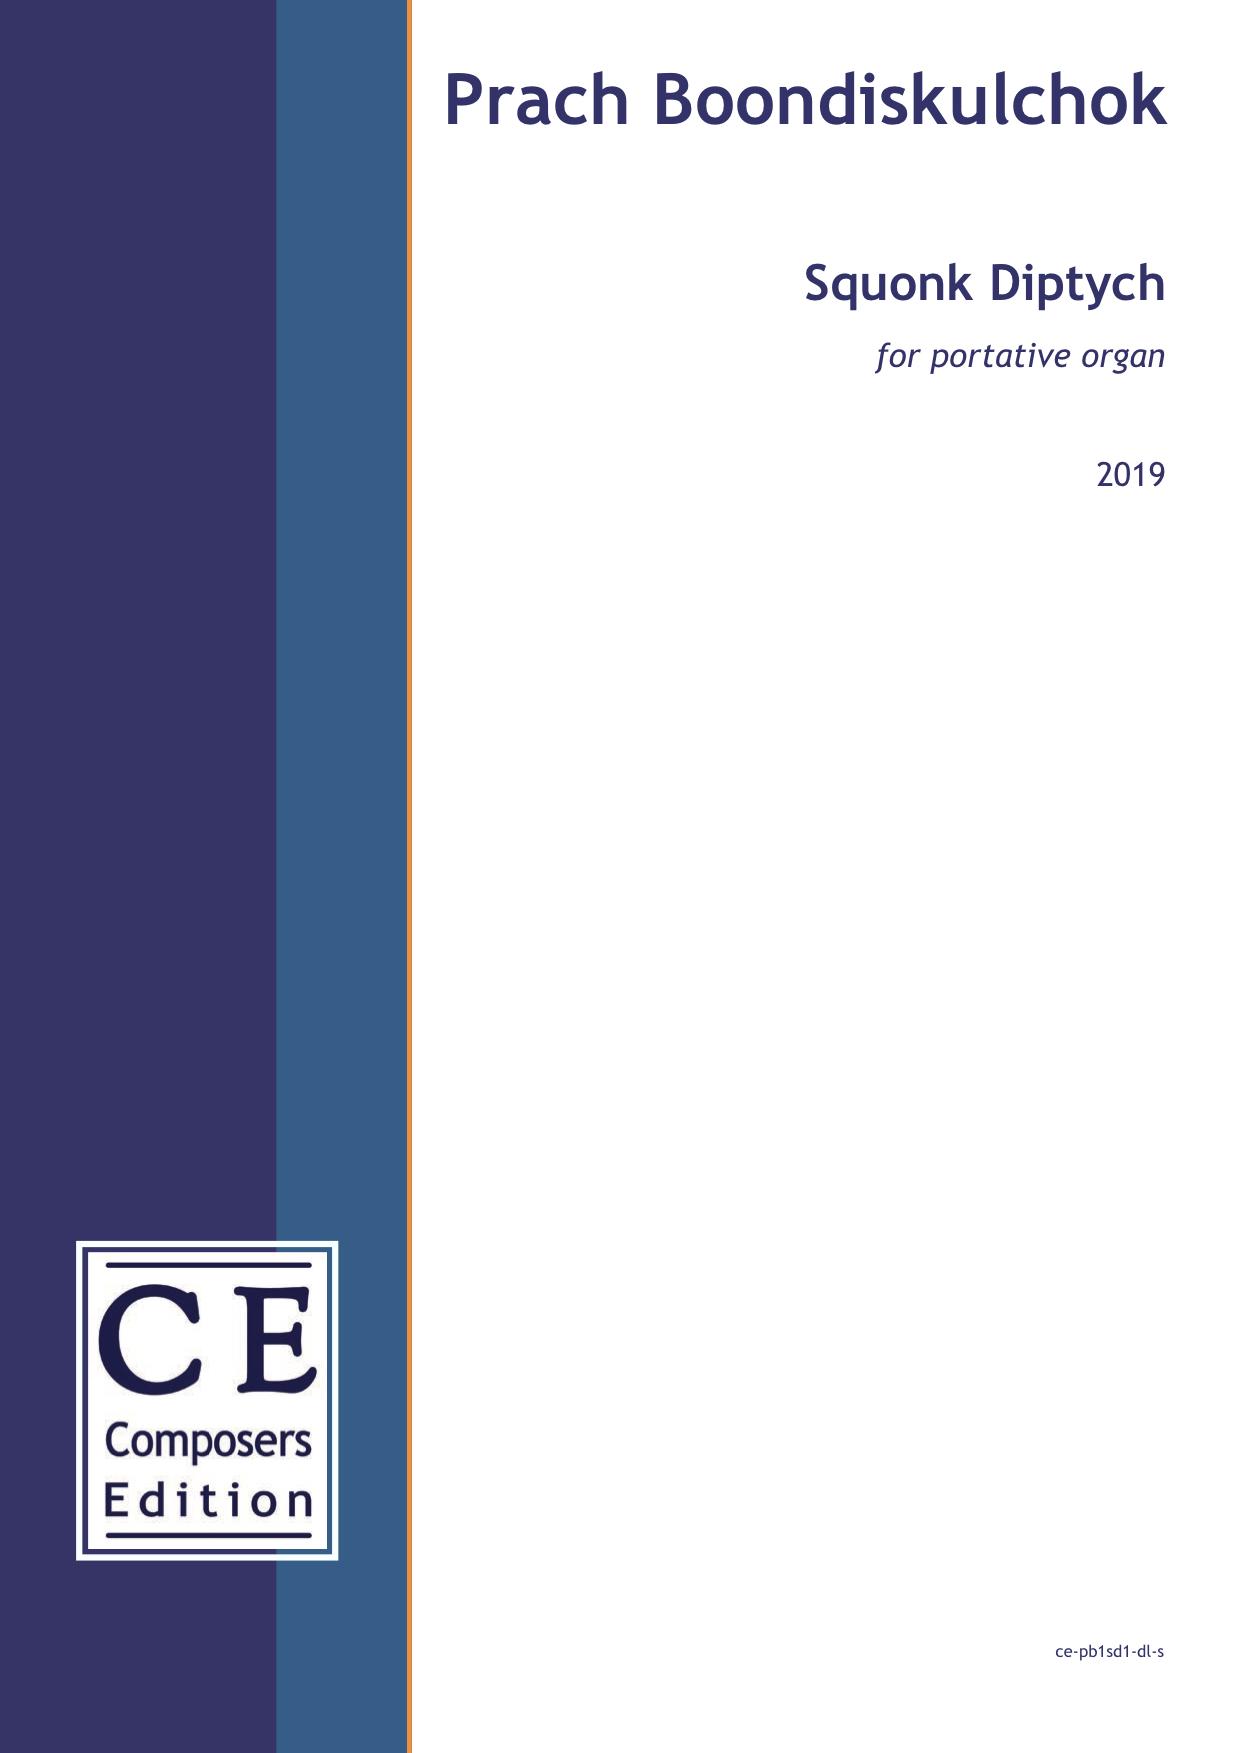 Prach Boondiskulchok: Squonk Diptych for portative organ